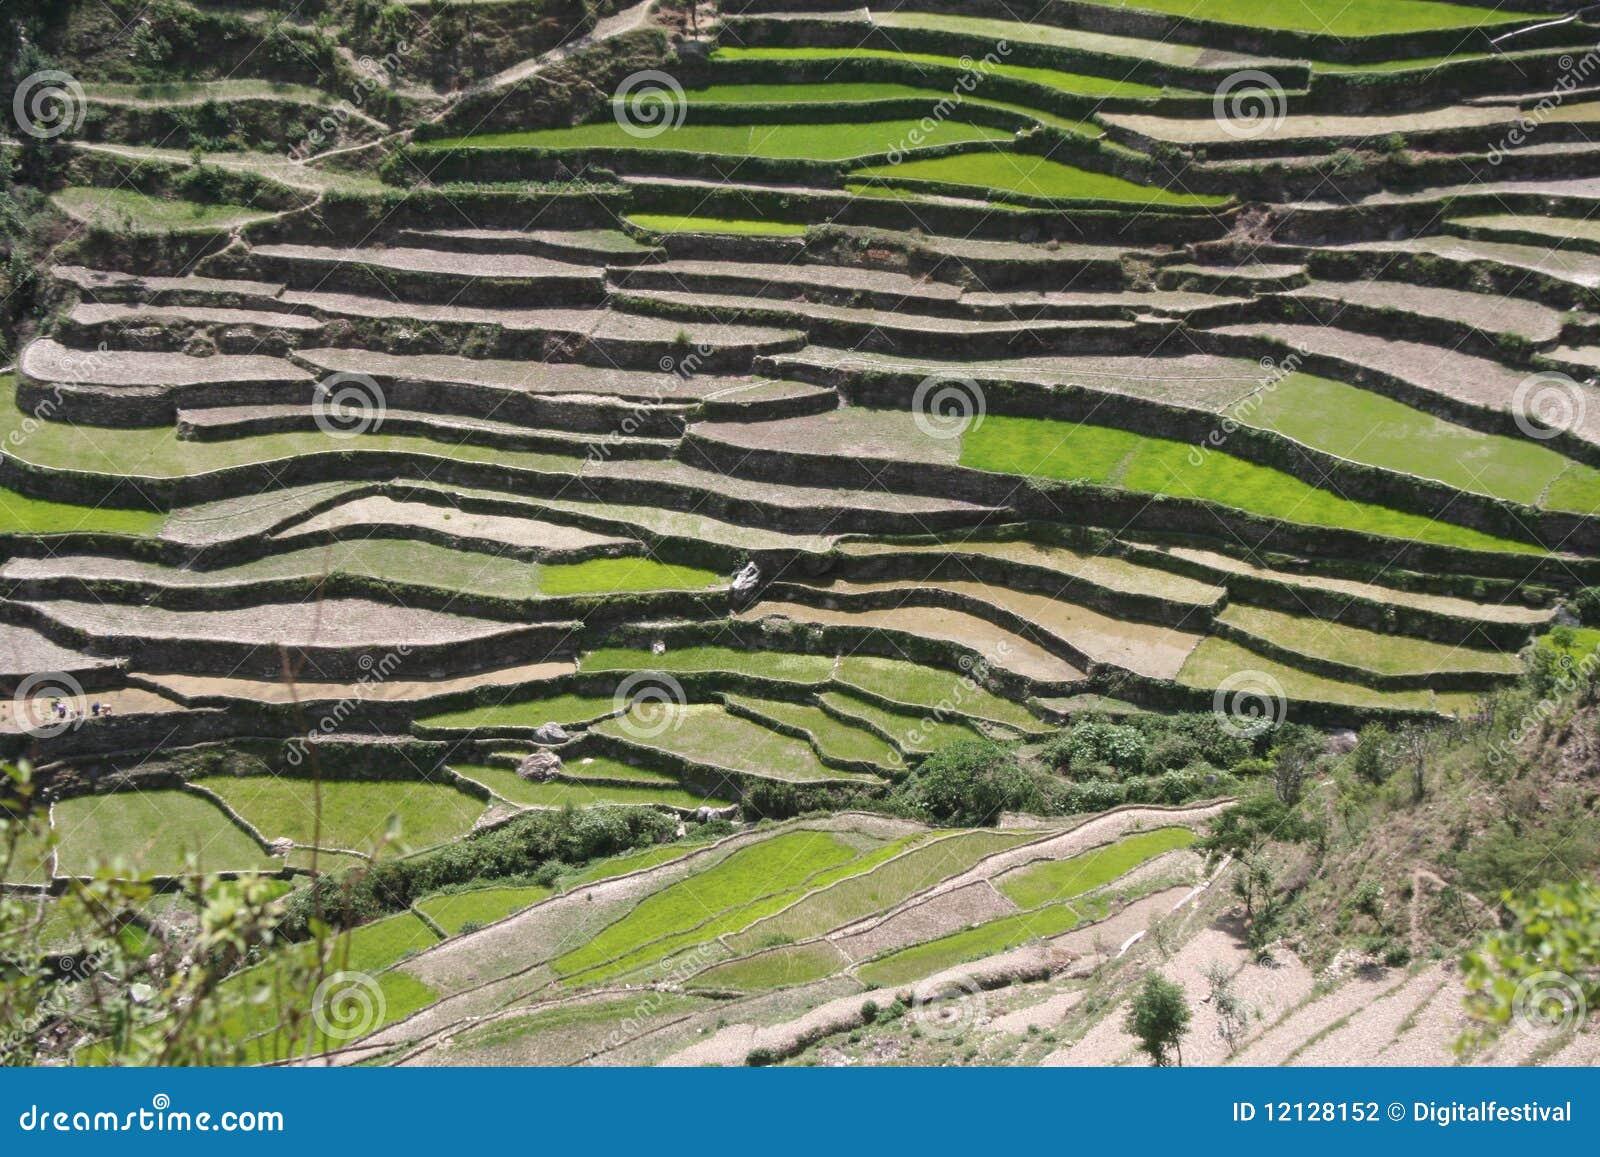 Himalayan steppe terrace farming uttaranchal india stock for Terrace farming images